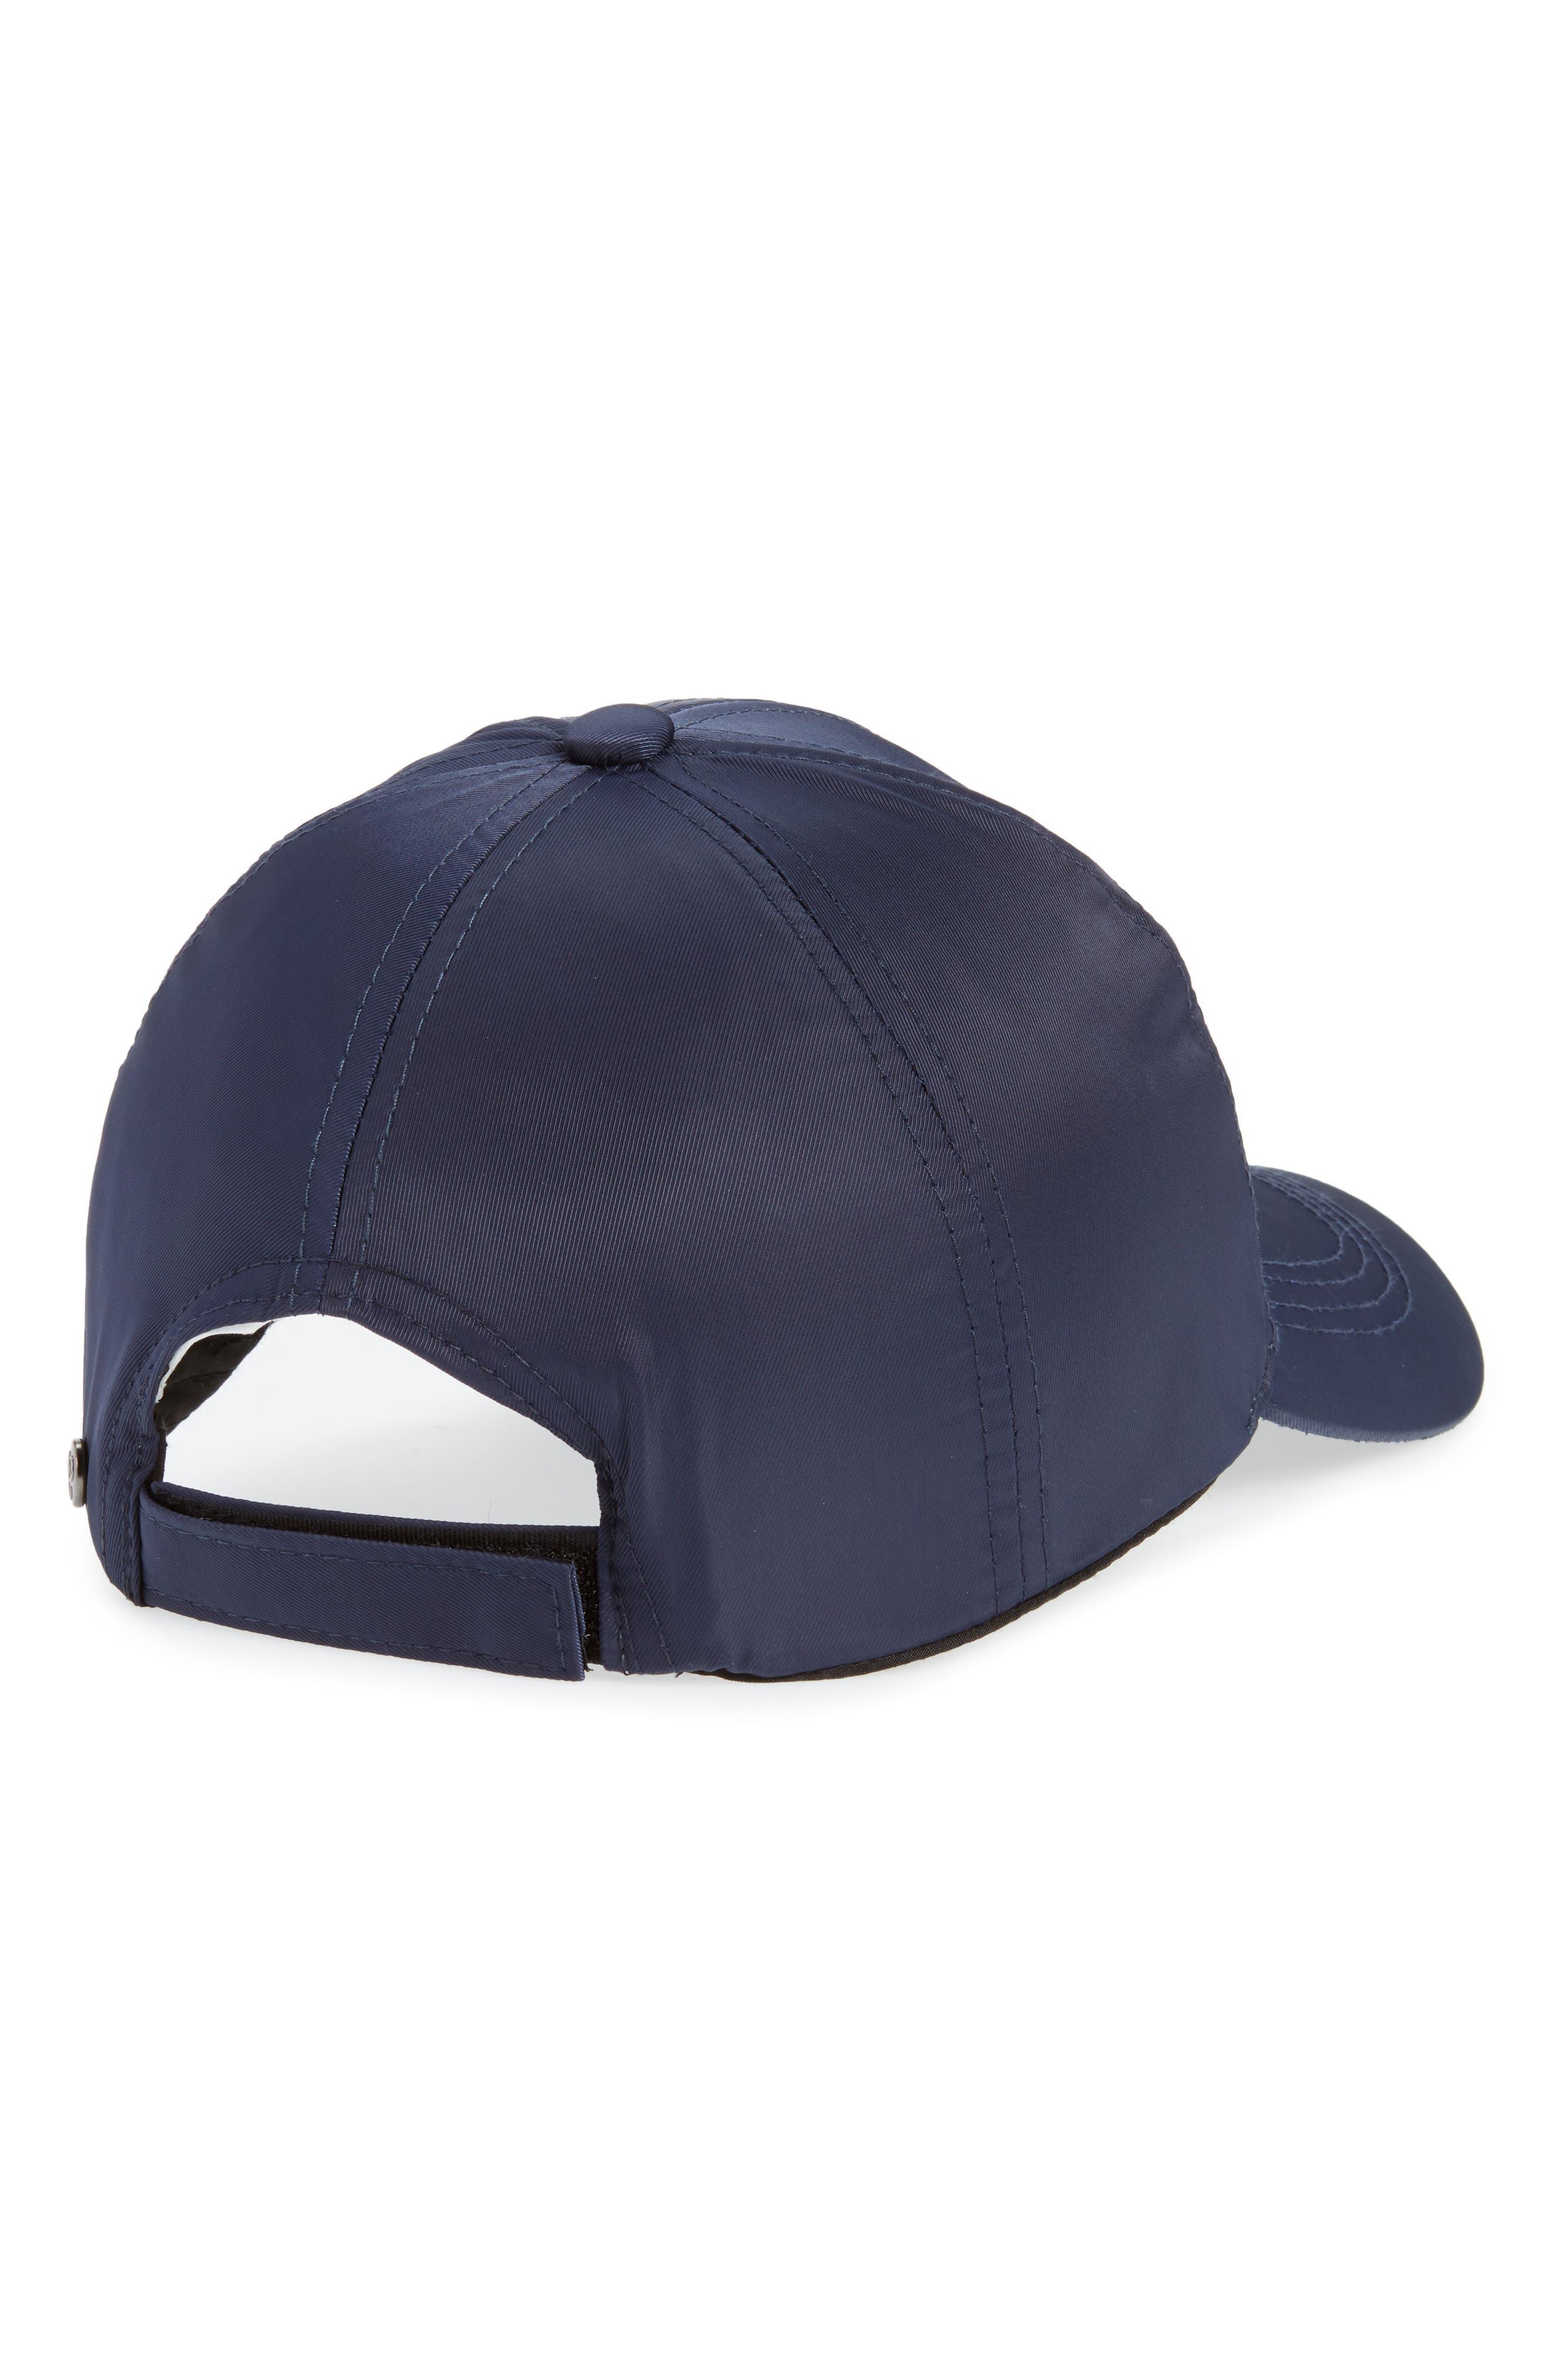 Water Repellent Baseball Hat,                             Alternate thumbnail 2, color,                             Blue Insignia